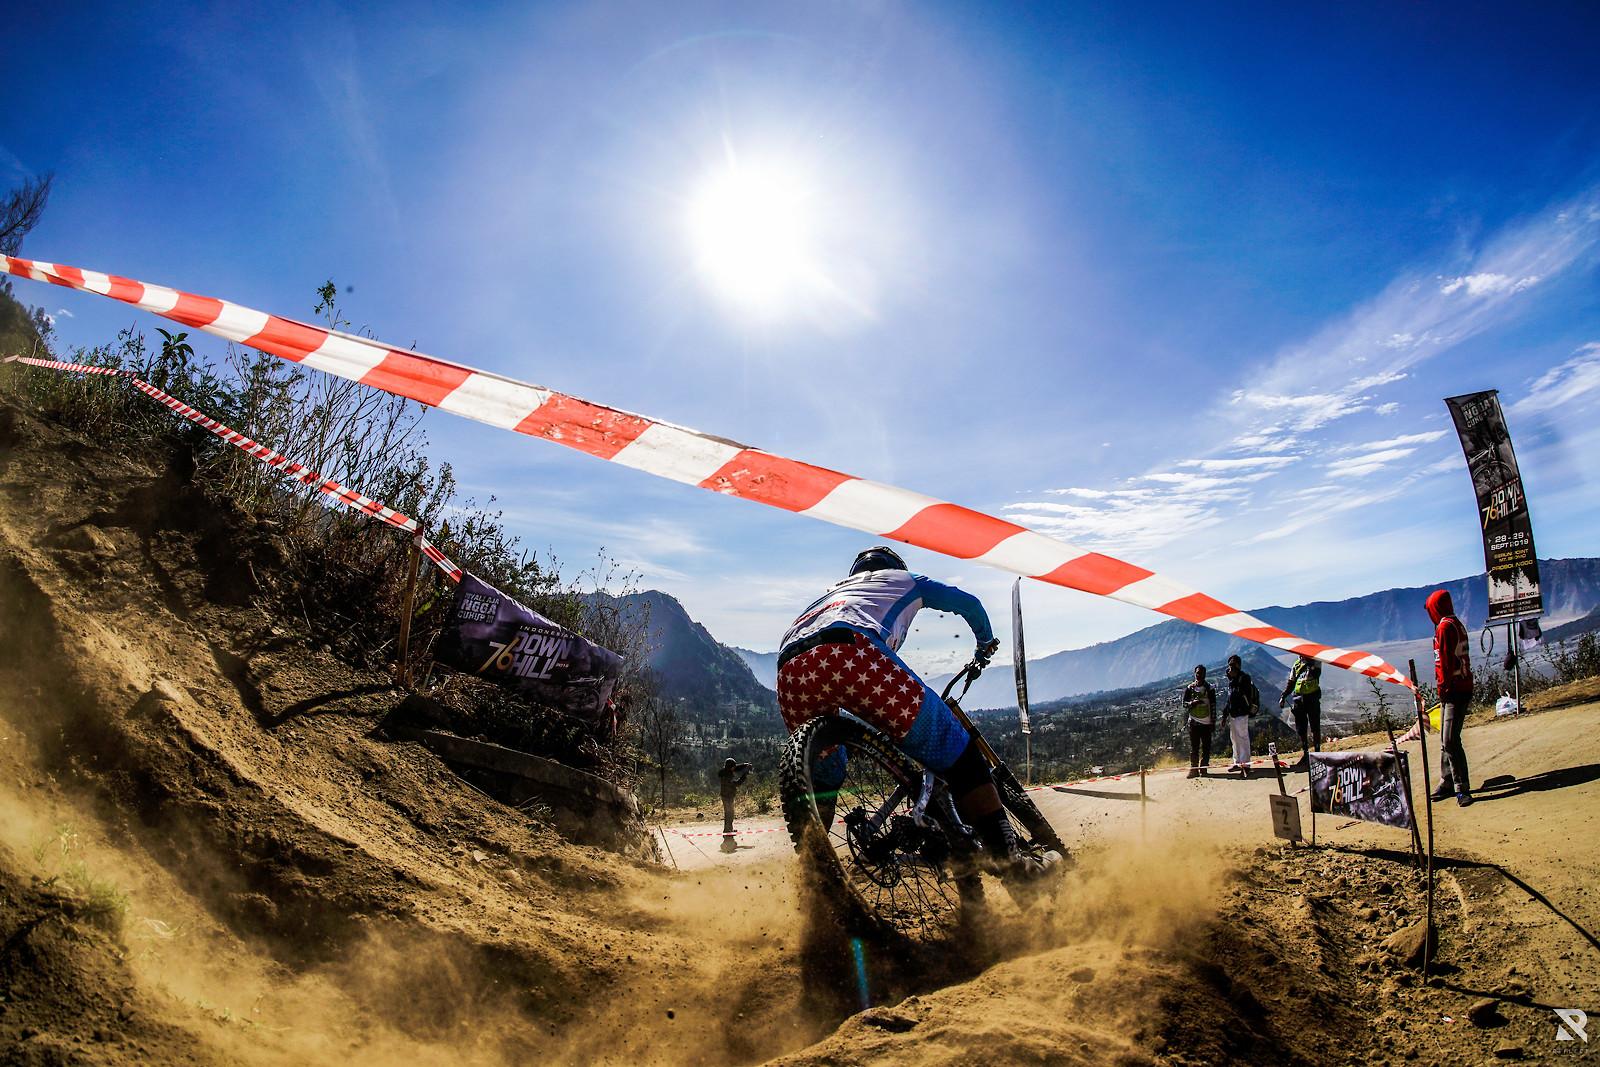 Dusty Trail - RezaAkhmad - Mountain Biking Pictures - Vital MTB